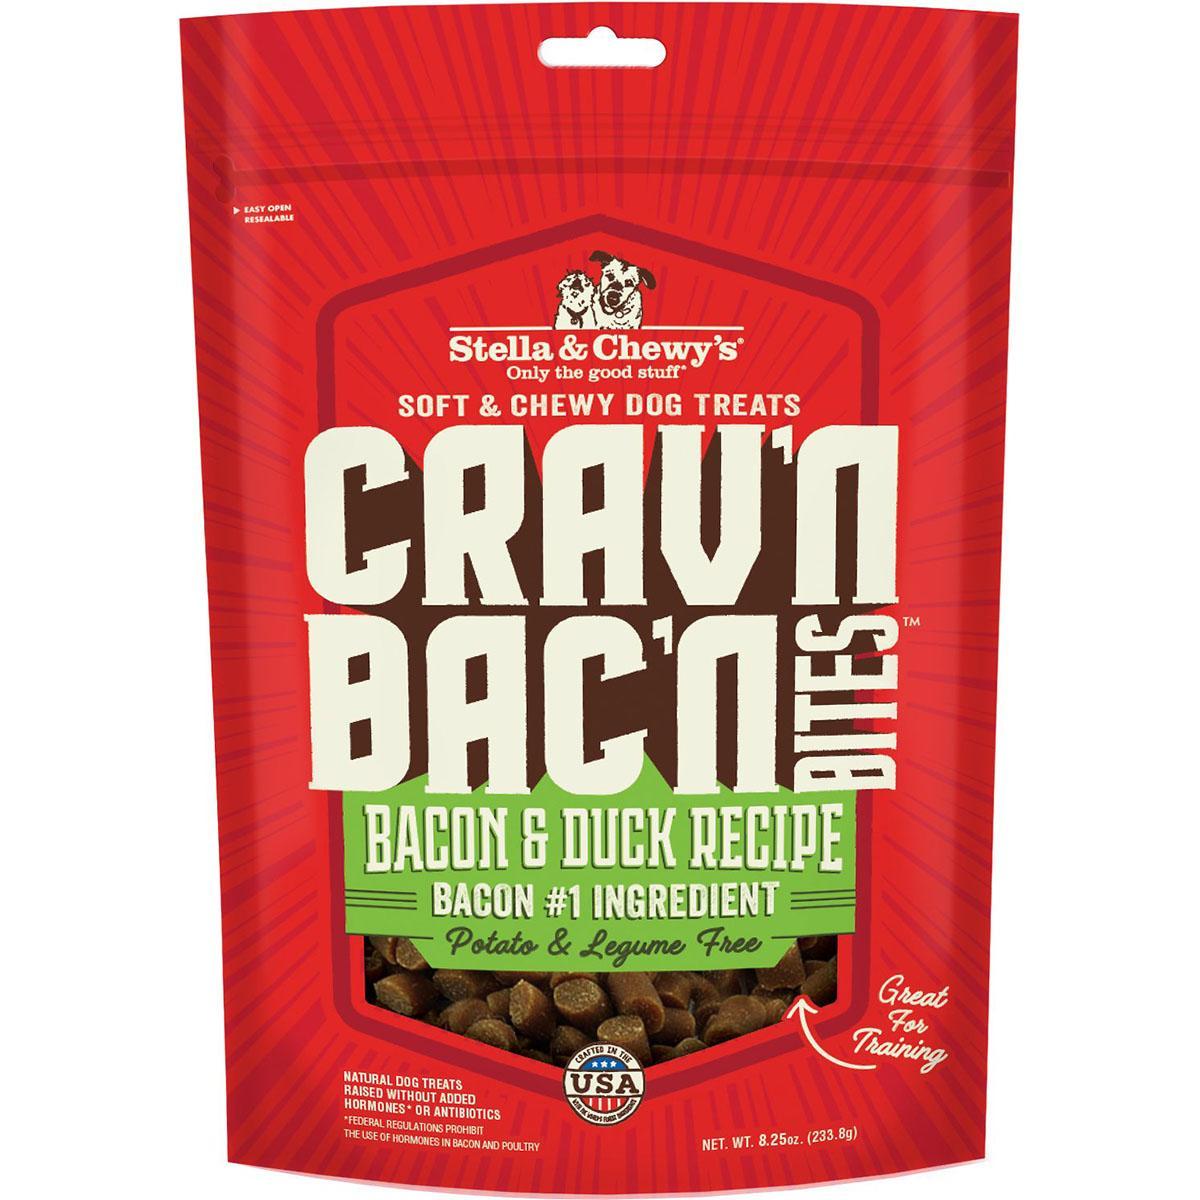 Stella & Chewy's Crav'n Bac'n Bites Bacon & Duck Recipe Dog Treats